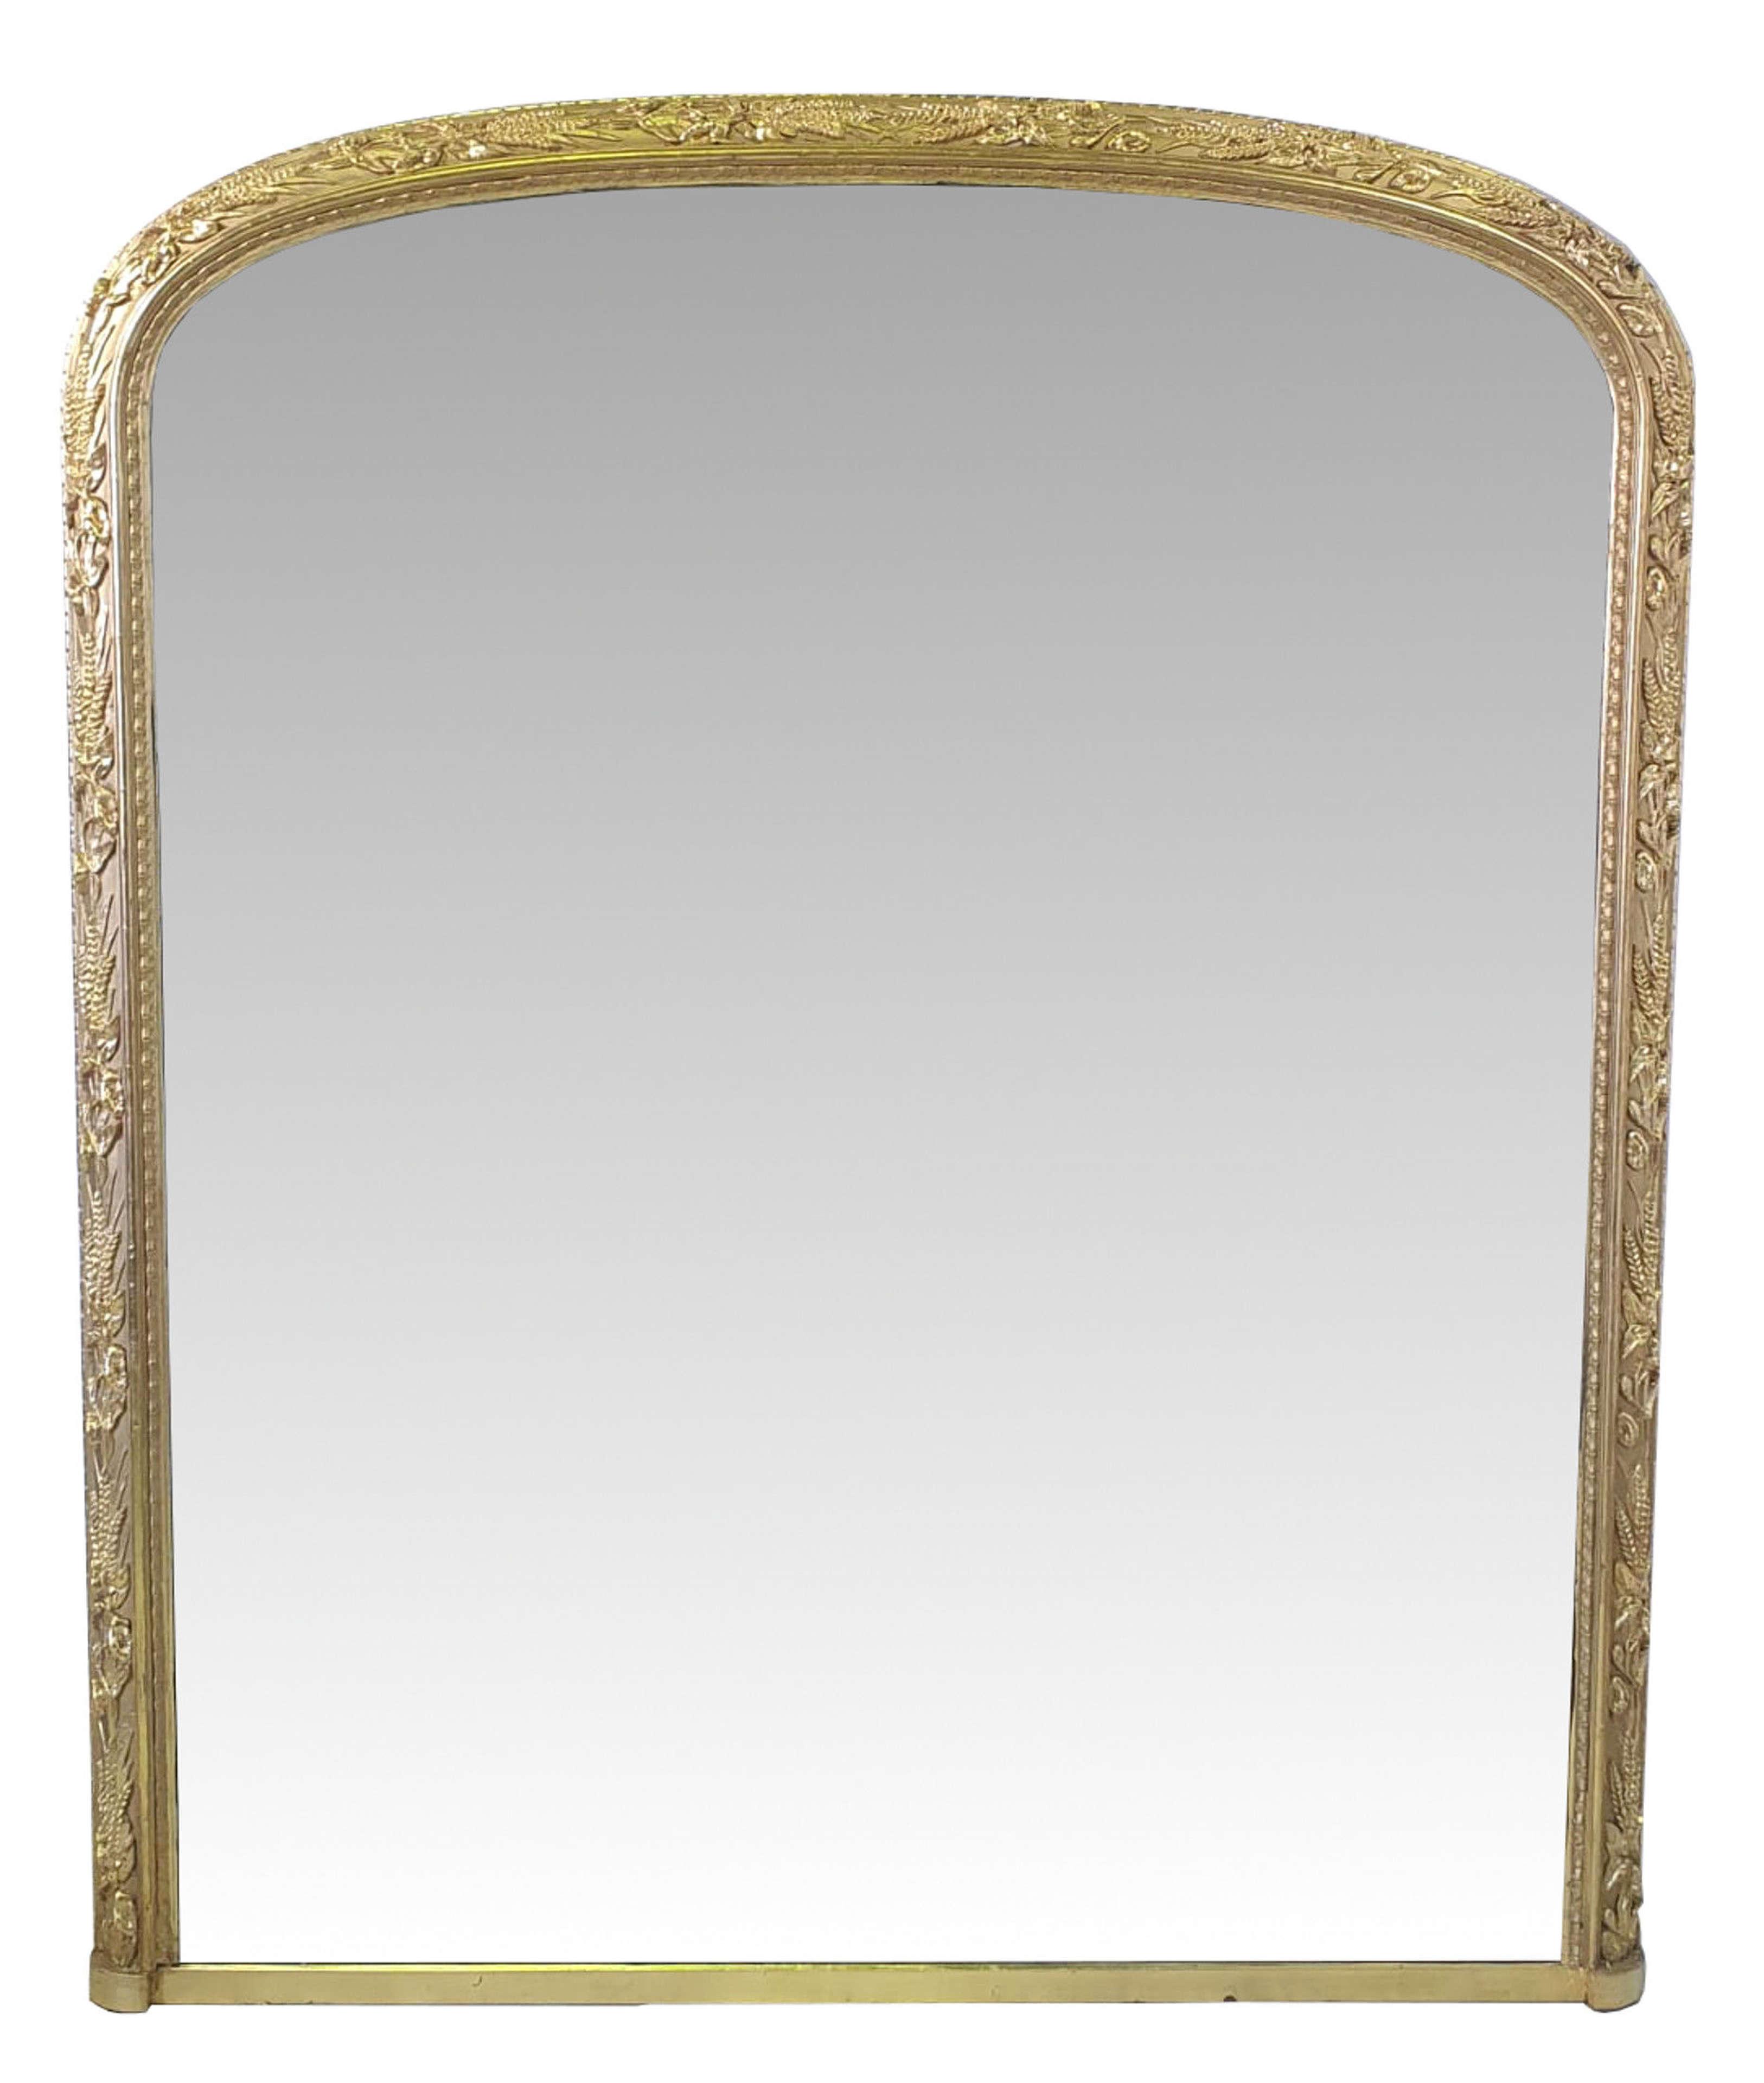 19th Century Gilt Framed Overmantle Mirror